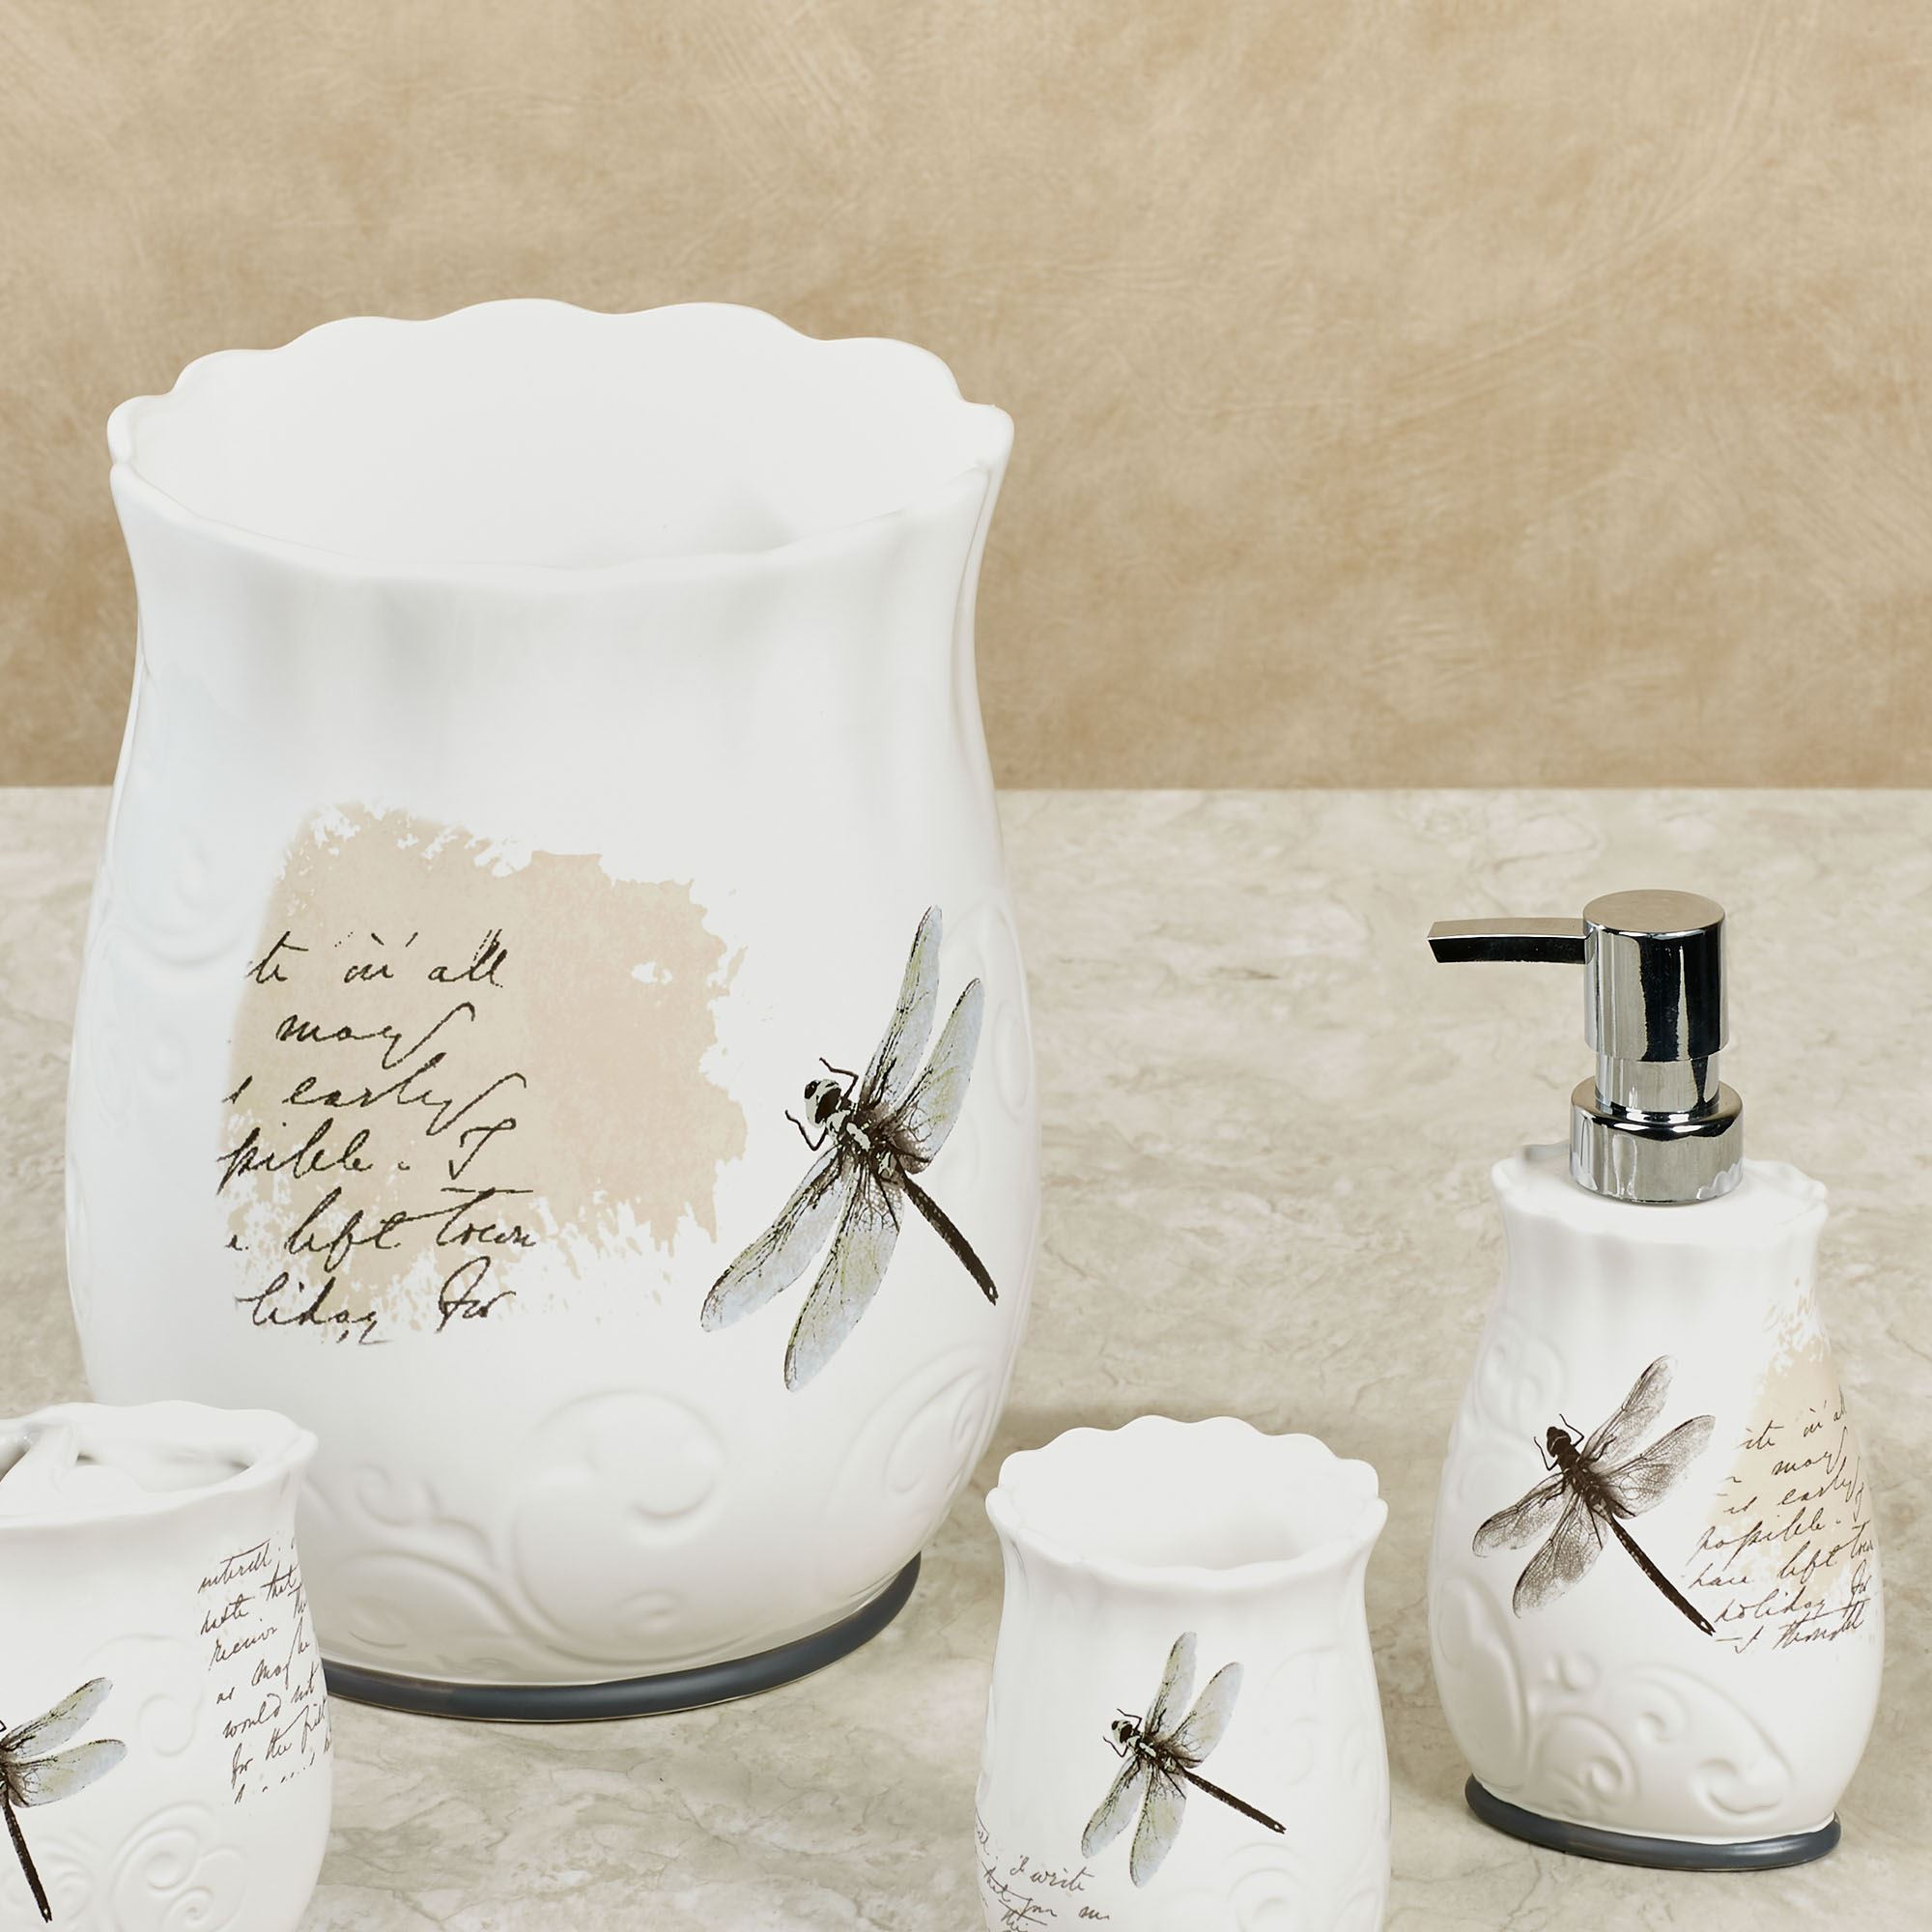 Dragonfly Ceramic Bath Accessories